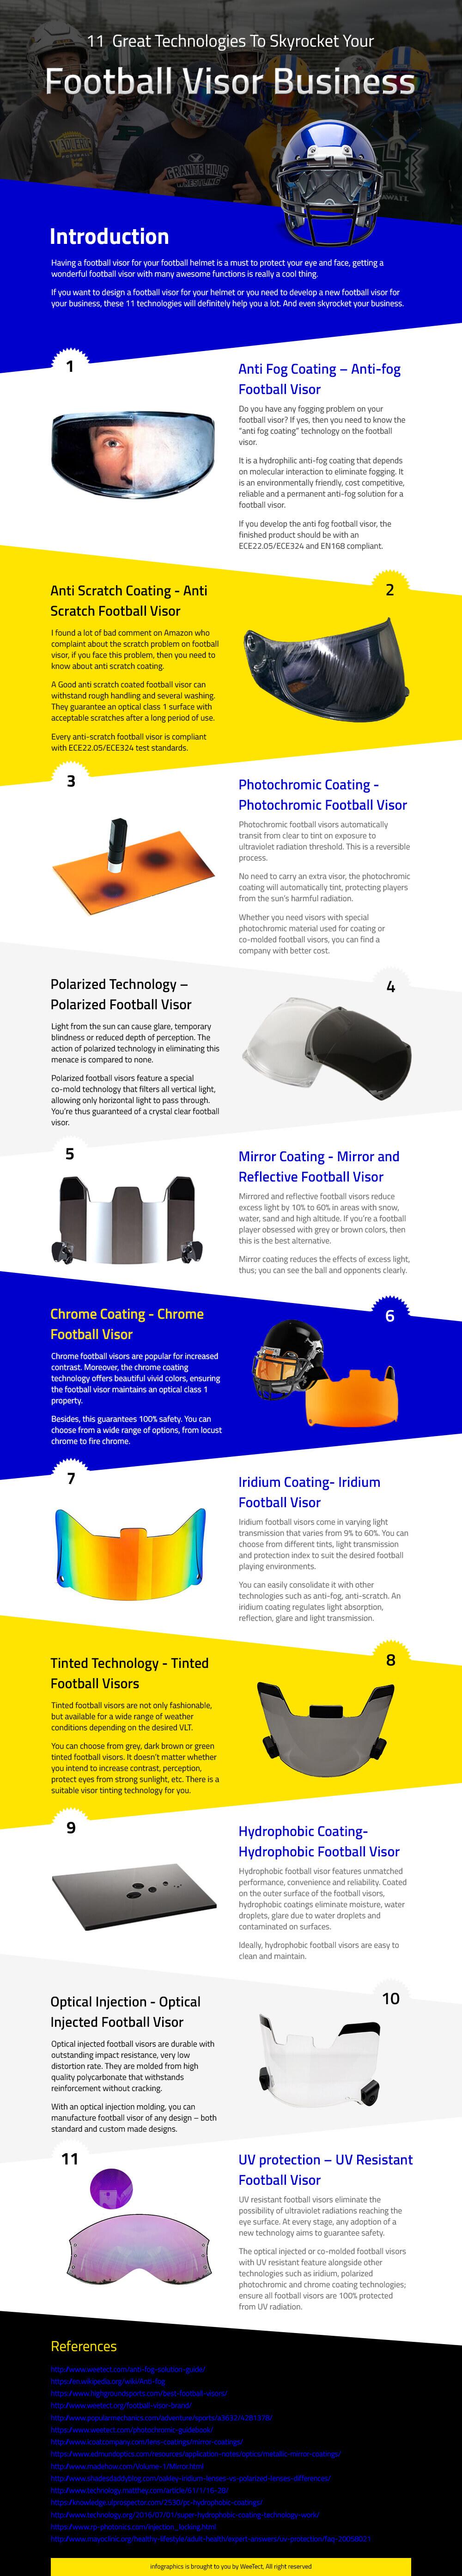 New-Gen Football Visors: 11 Great Technologies - Infographic